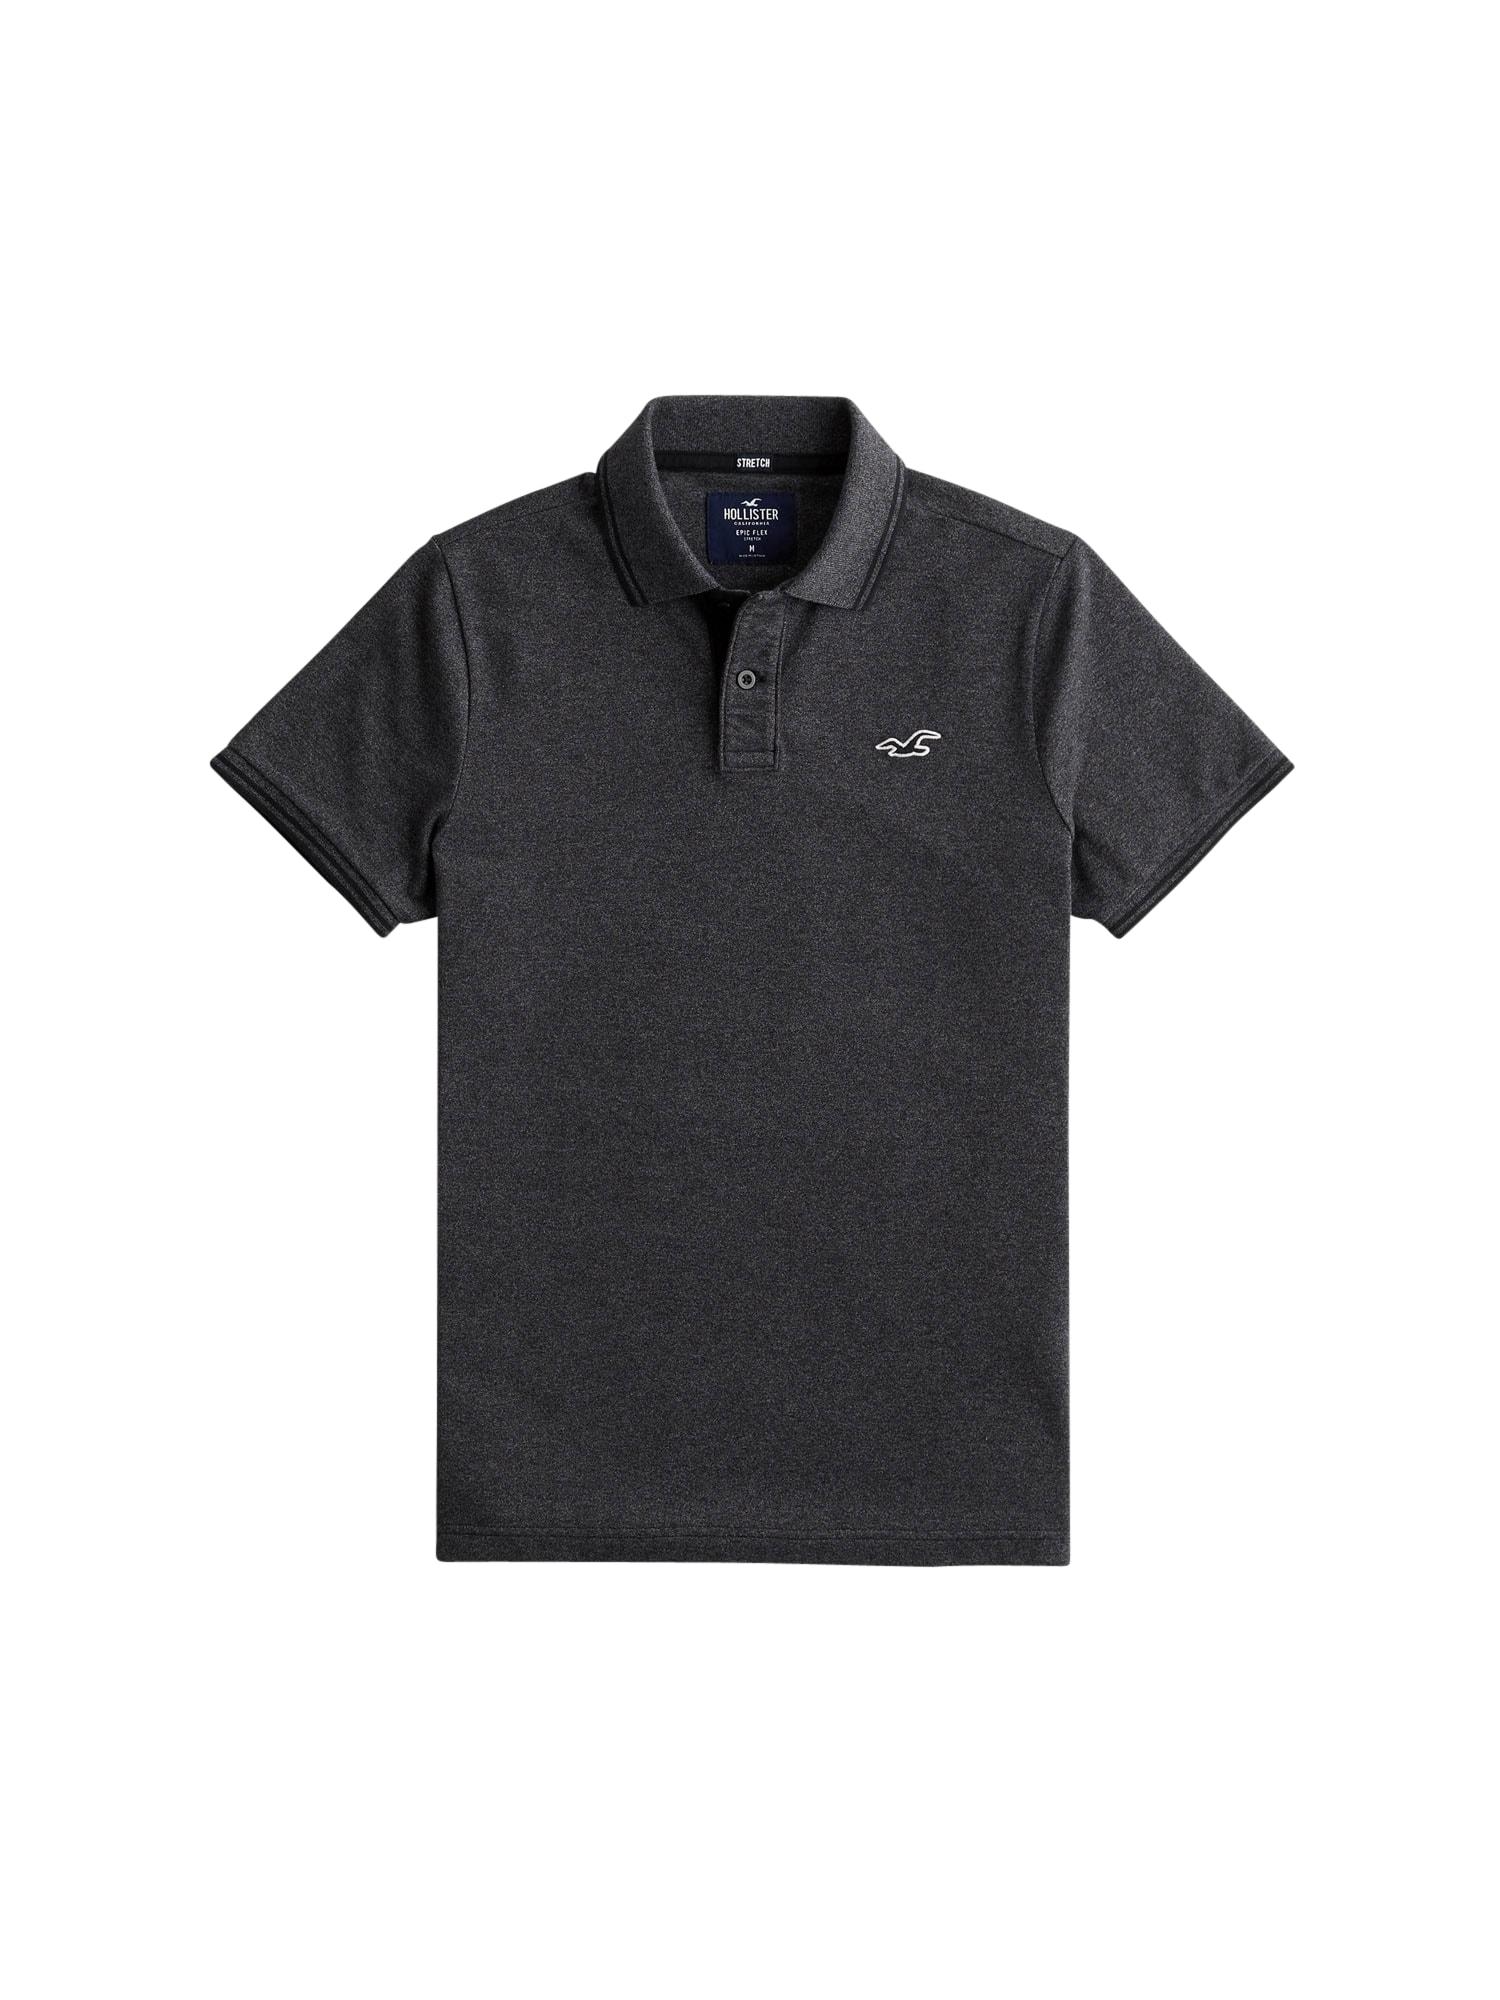 HOLLISTER Marškinėliai 'CORE' margai pilka